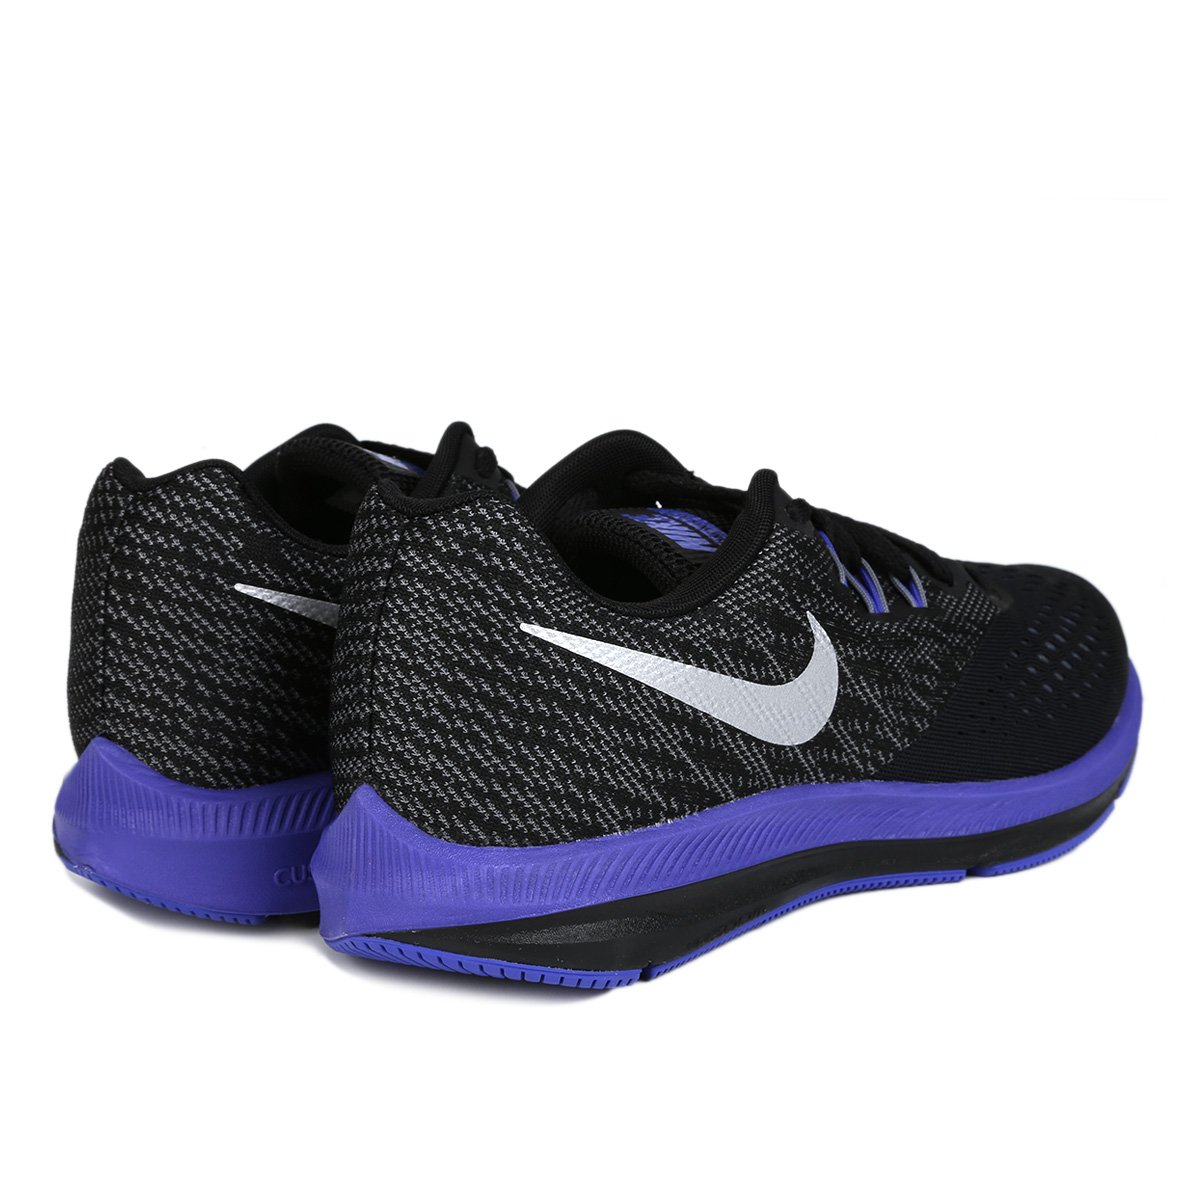 334ad20cb8 Tênis Nike Zoom Winflo 4 Feminino